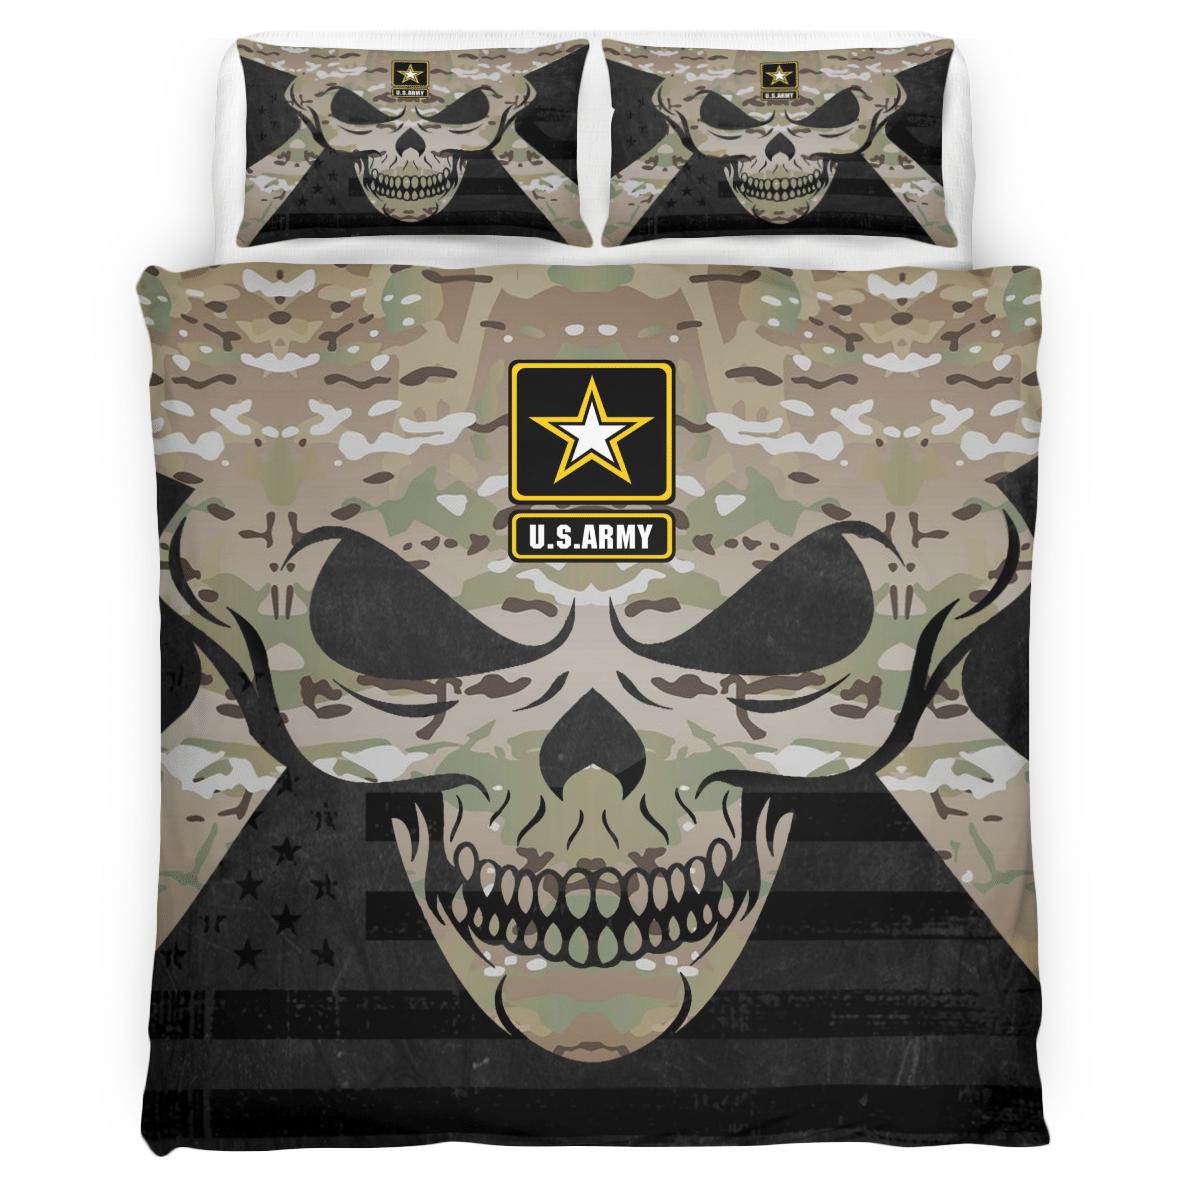 US Army Camo Skull Bedding Set